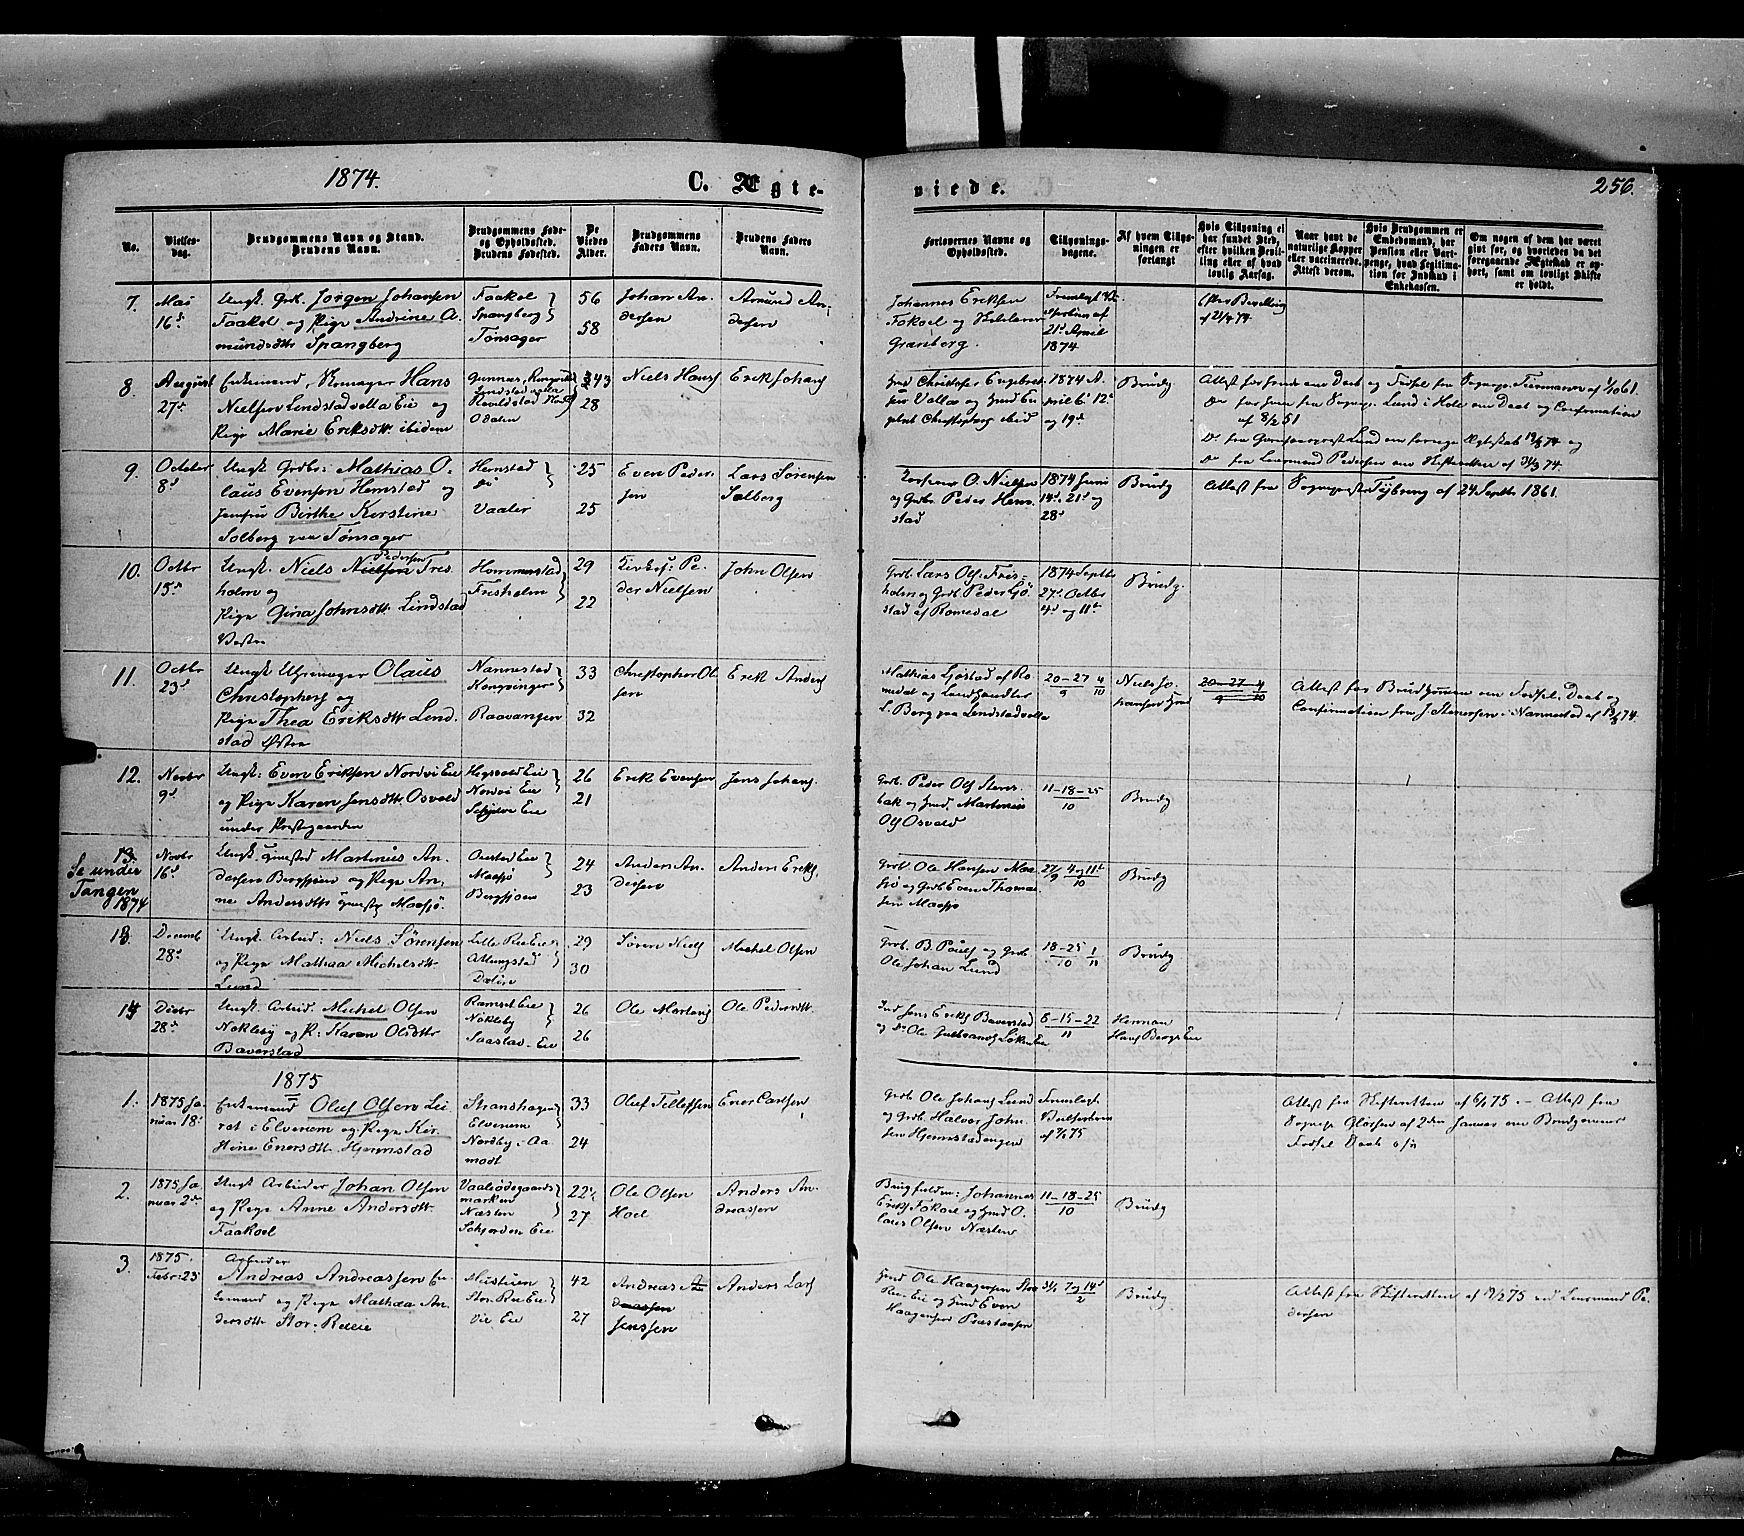 SAH, Stange prestekontor, K/L0013: Ministerialbok nr. 13, 1862-1879, s. 256